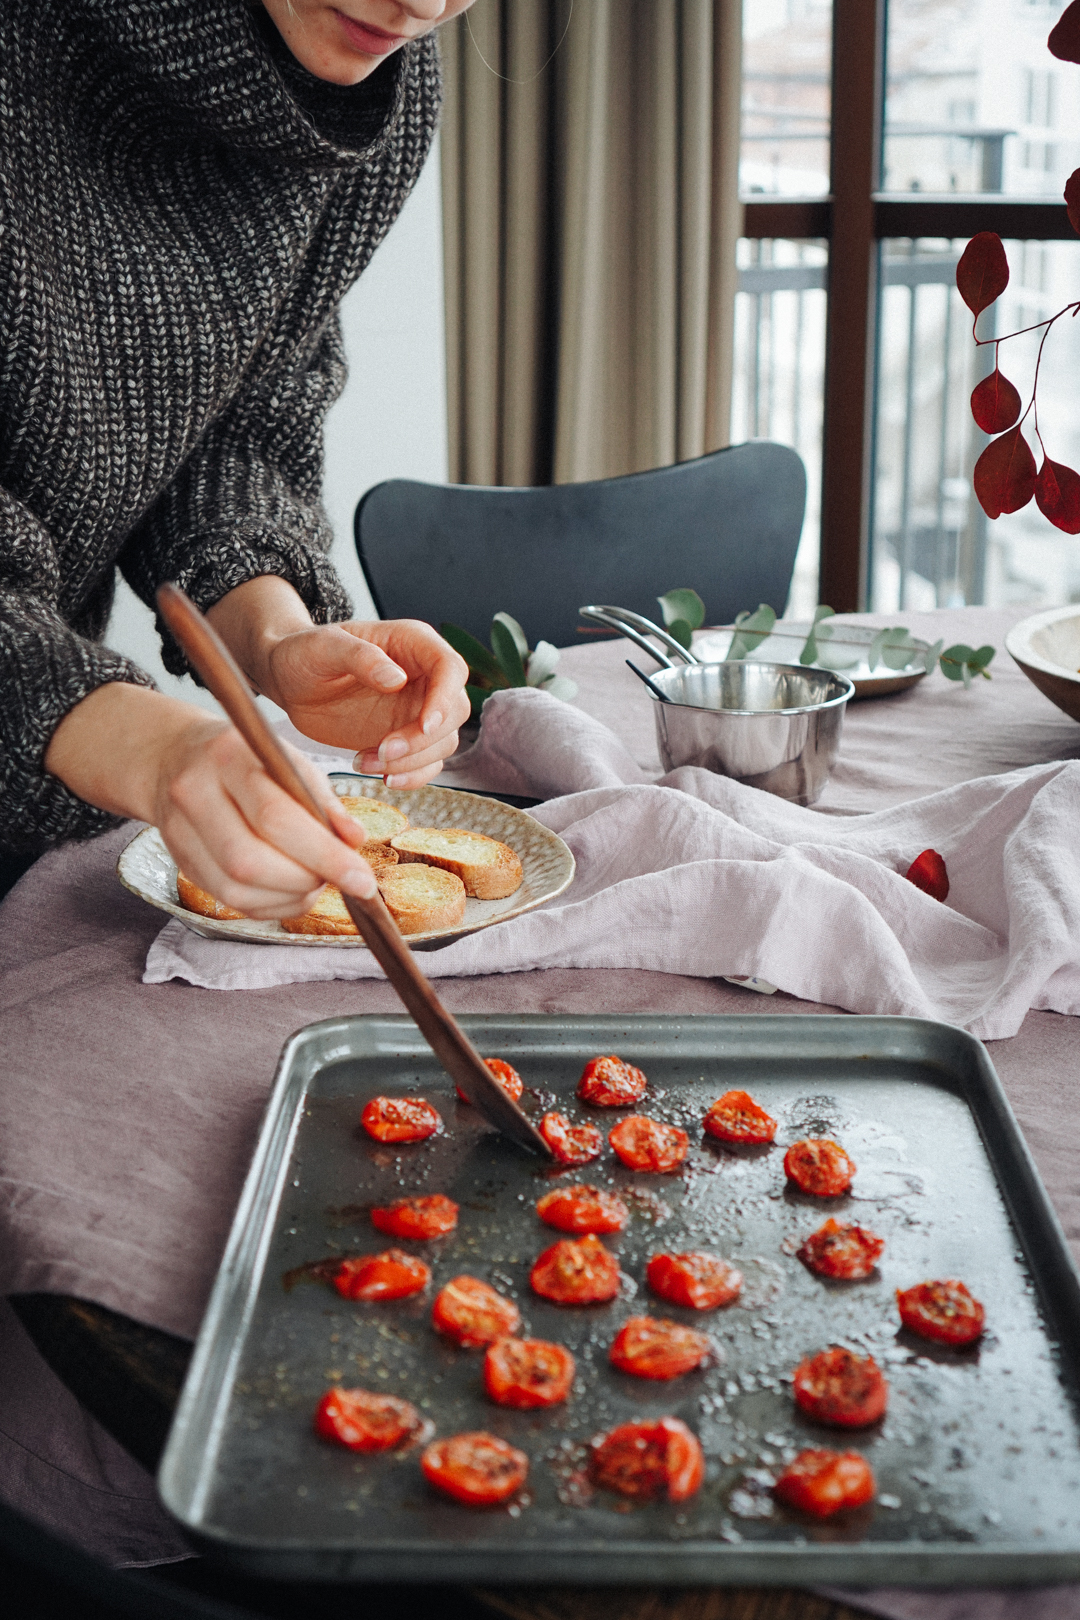 roasted_cherry_tomato_bruschettas_with_balsamic_glaze_smaller-3.jpg